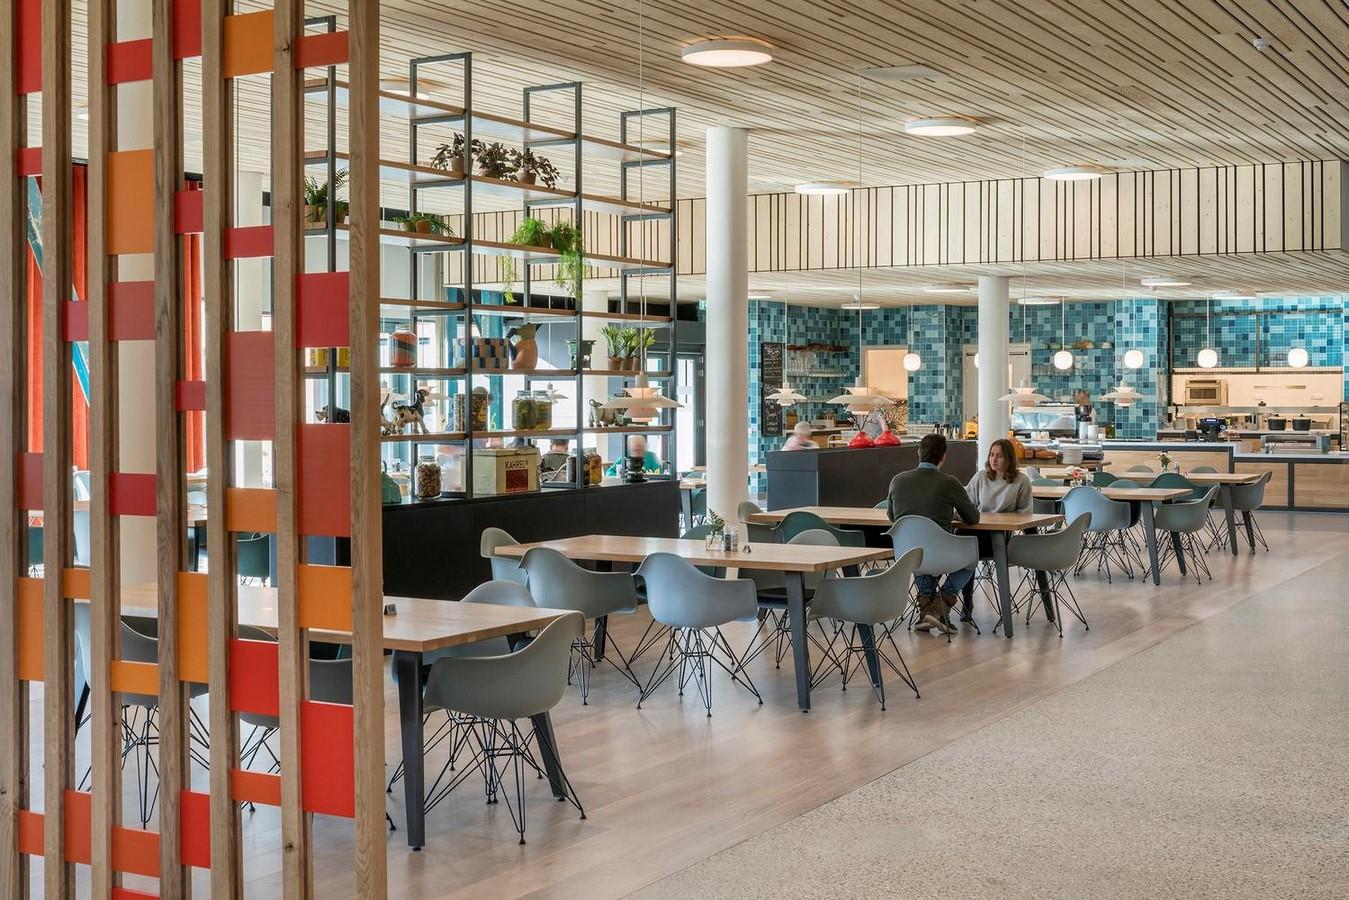 Scheldehof Residential Care Centre, The Netherlands - Sheet2